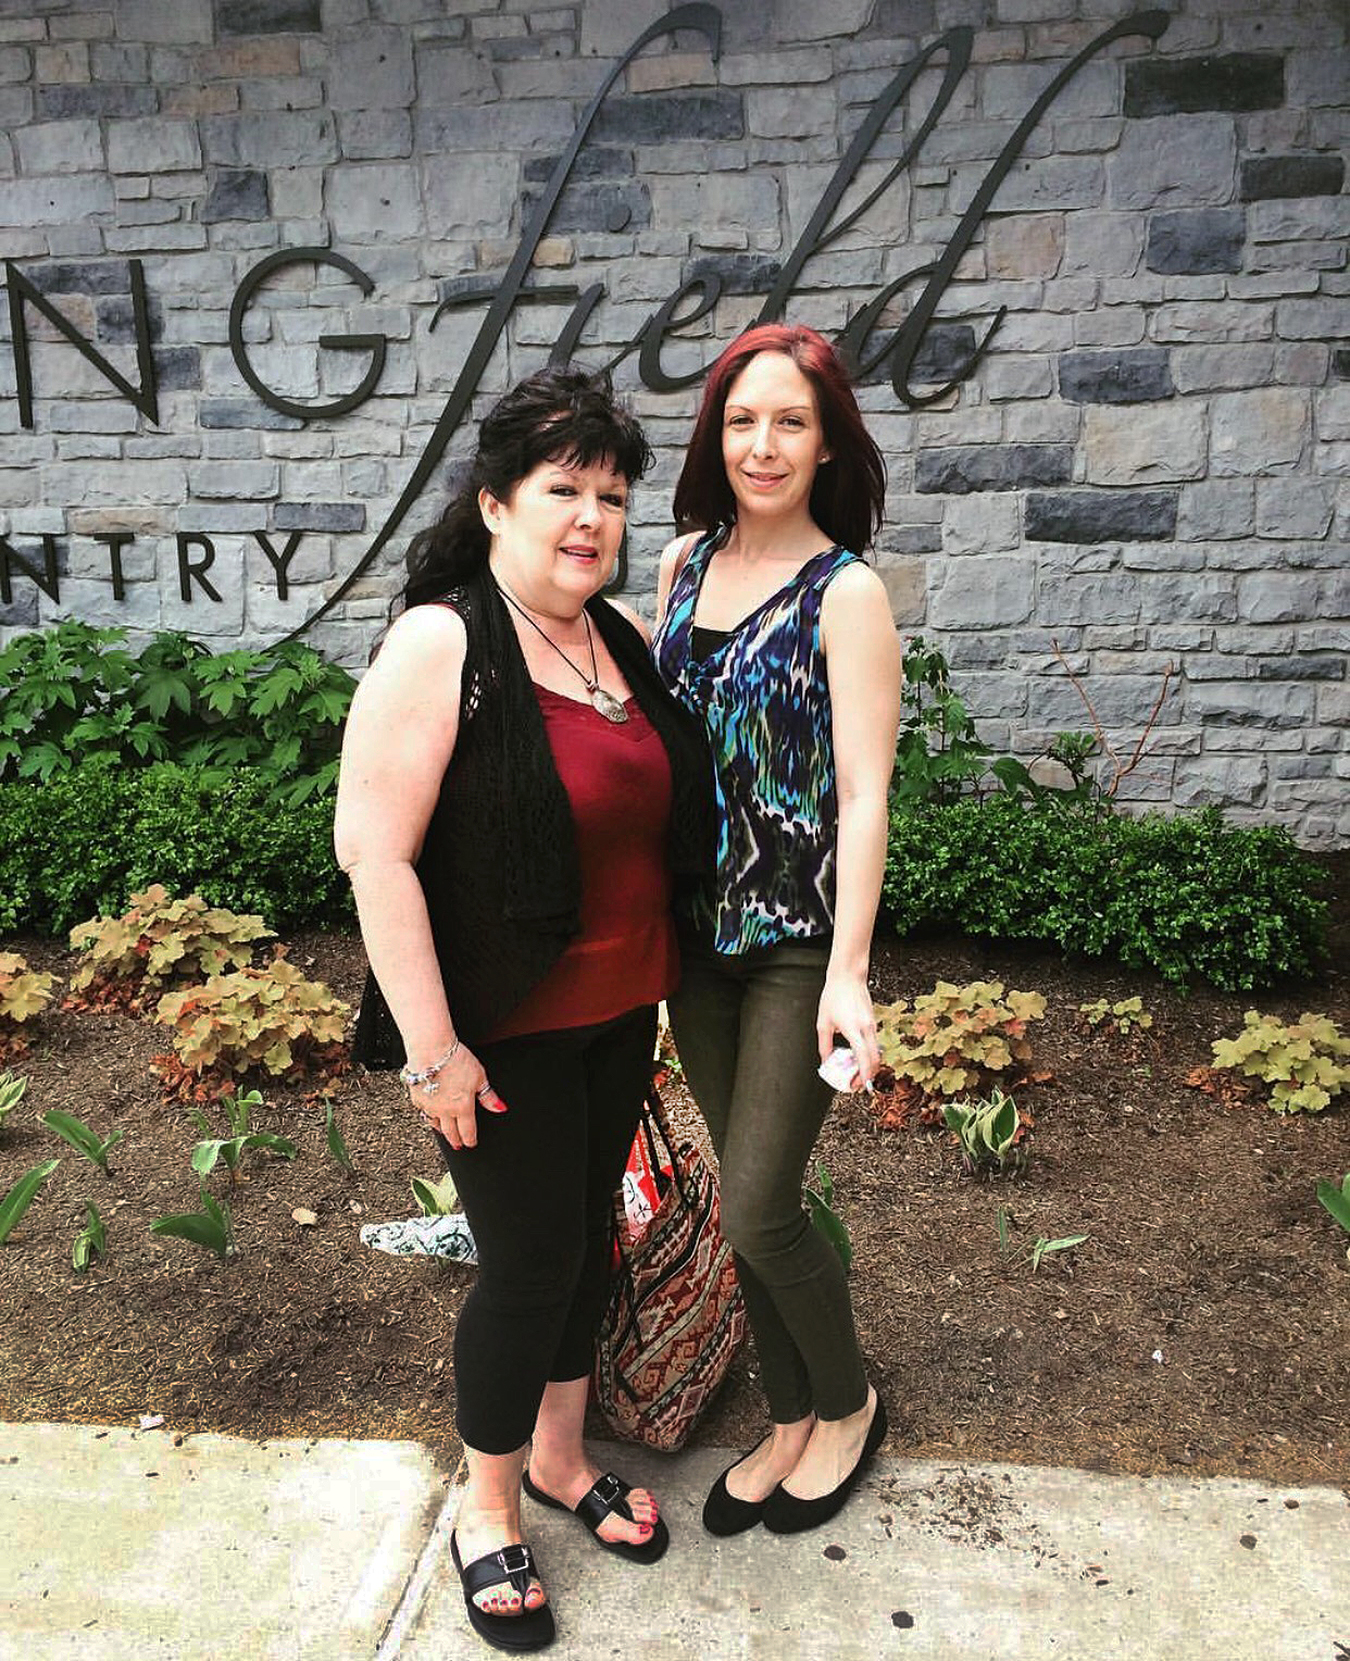 Katie_kerl_mom_hospital_walker_family_love_honor